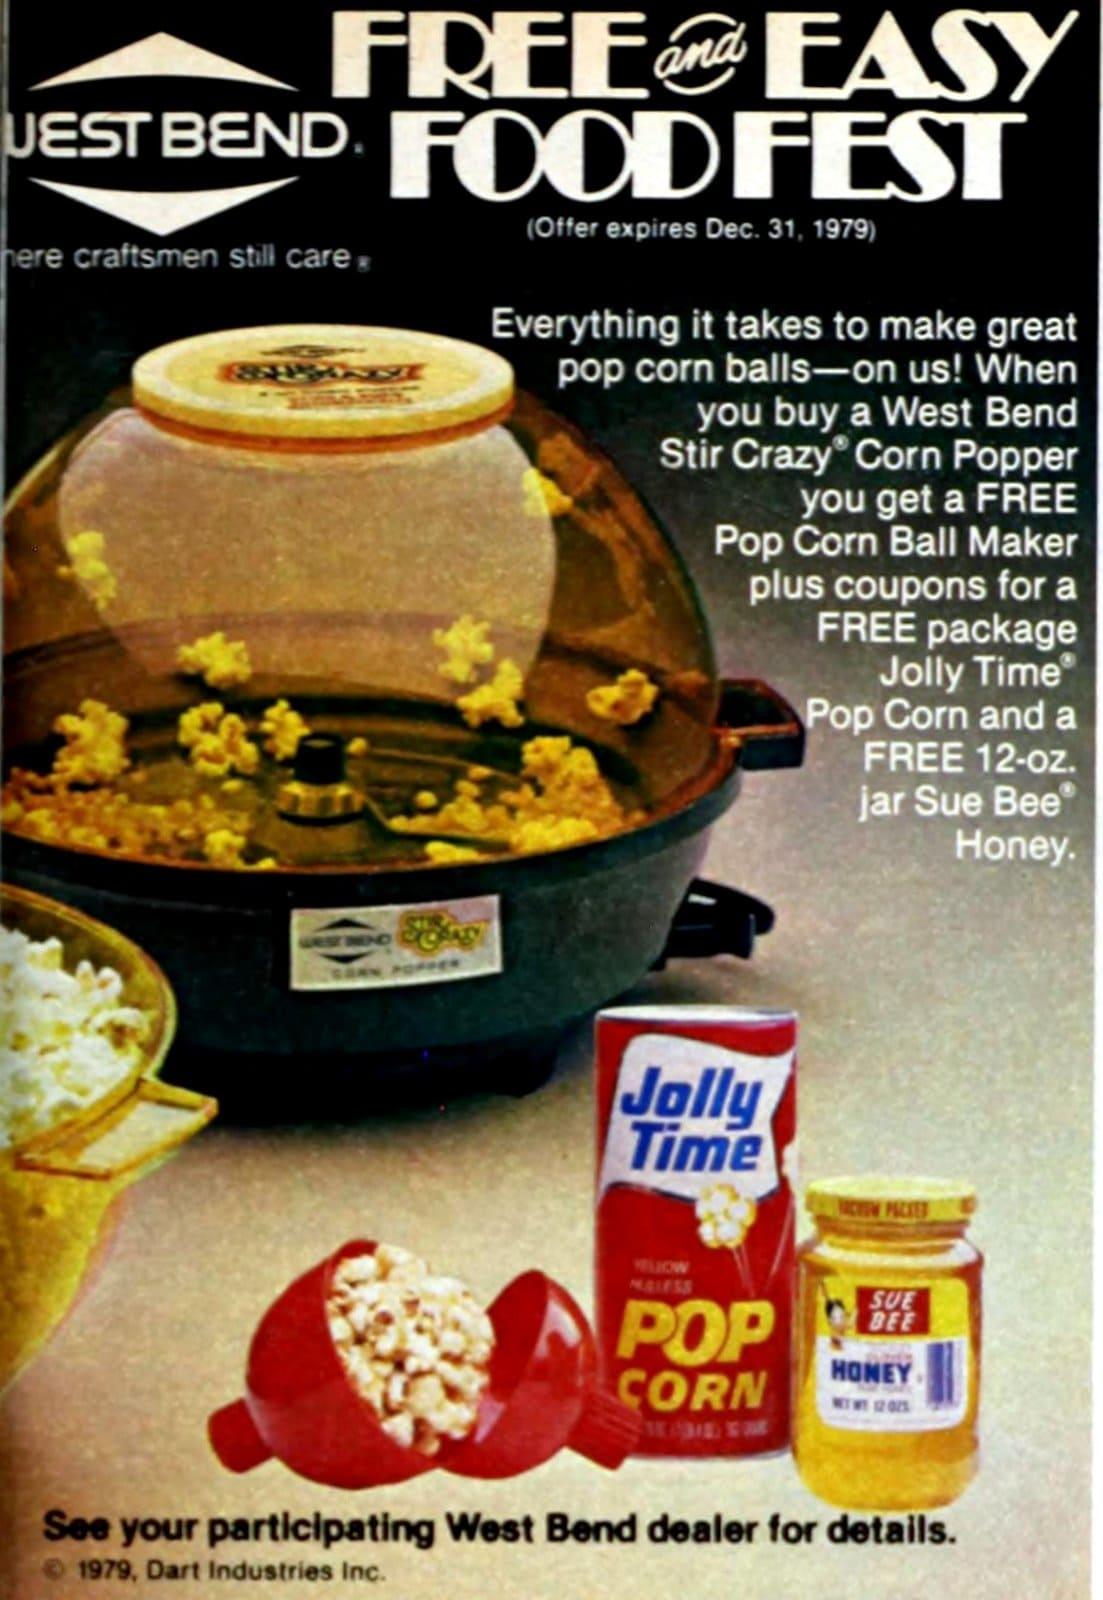 West Bend -- Stir Crazy Corn Popper (1979)